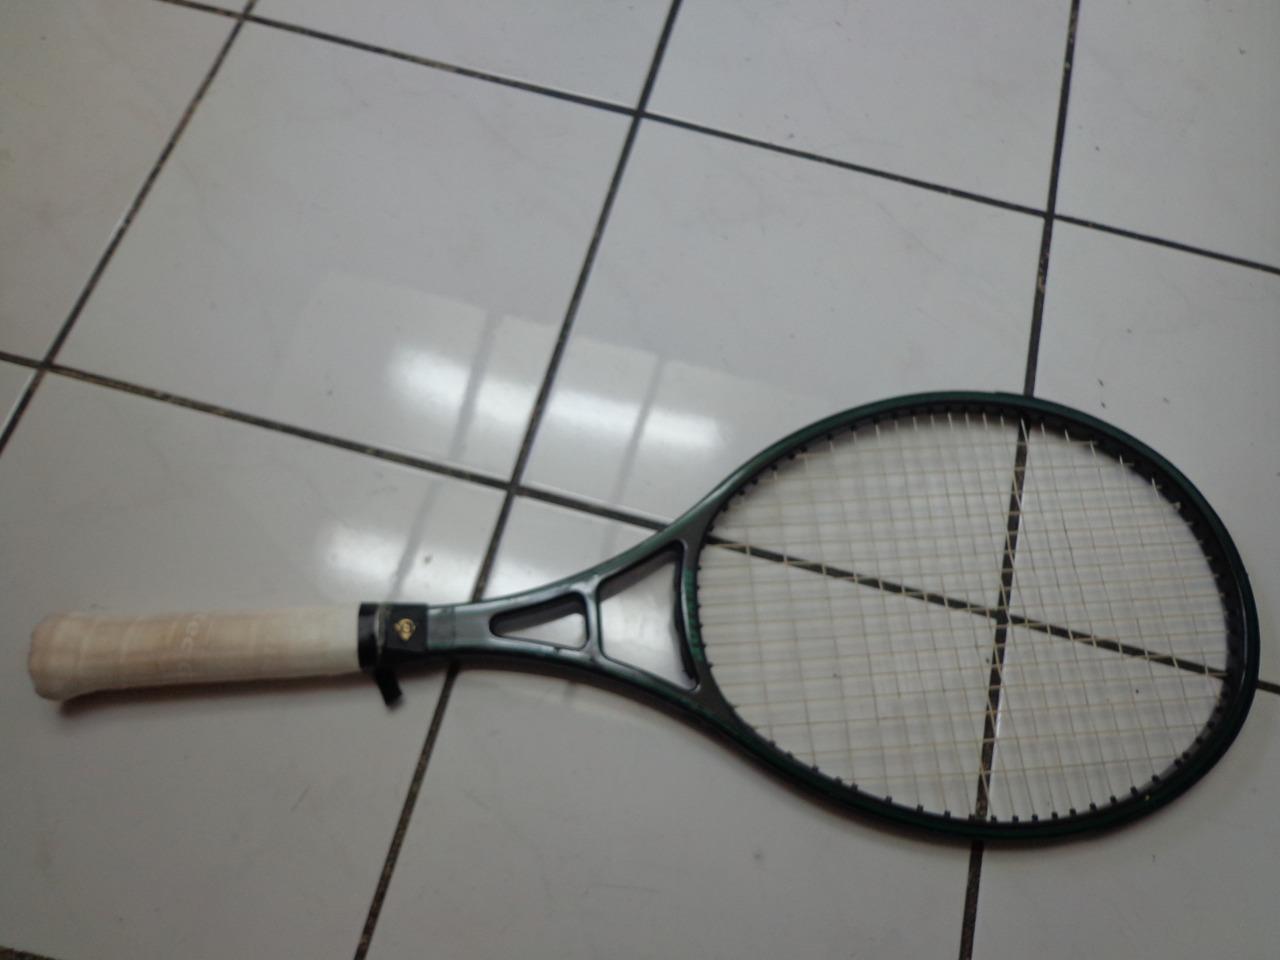 Dunlop Raro John McEnroe GRPAHITE 90 4 1 2 Grip Tenis Raqueta